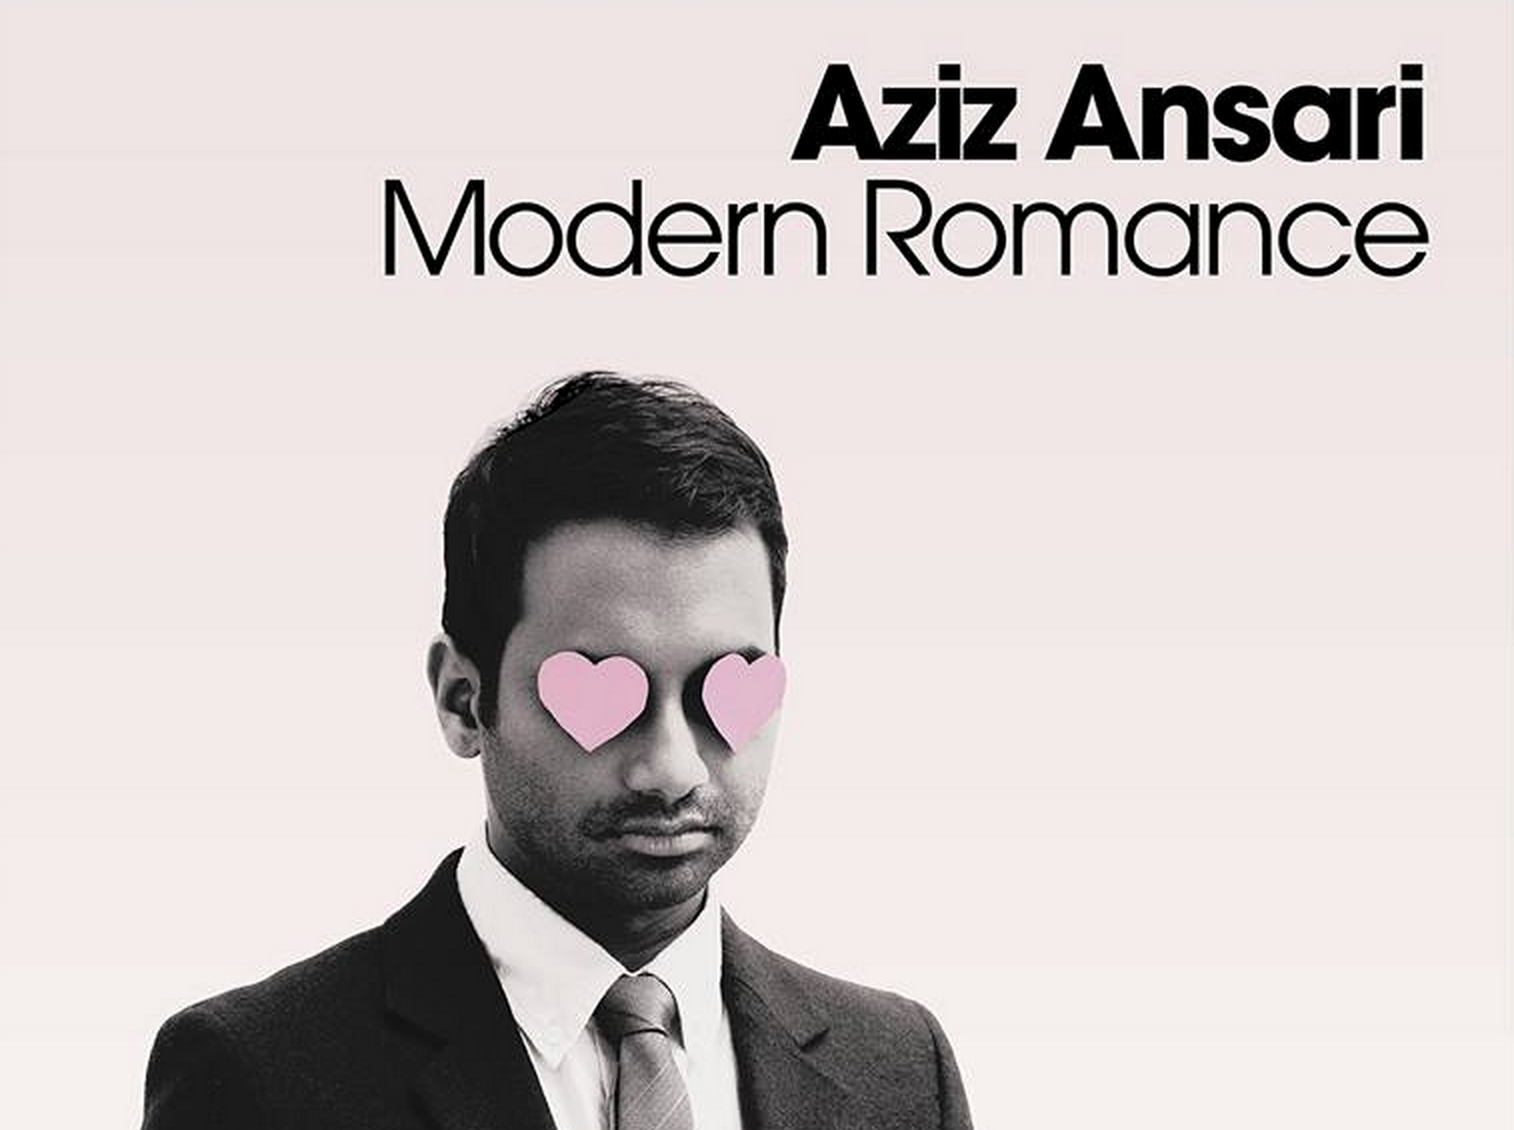 Aziz ansari dating sites why texting ruined